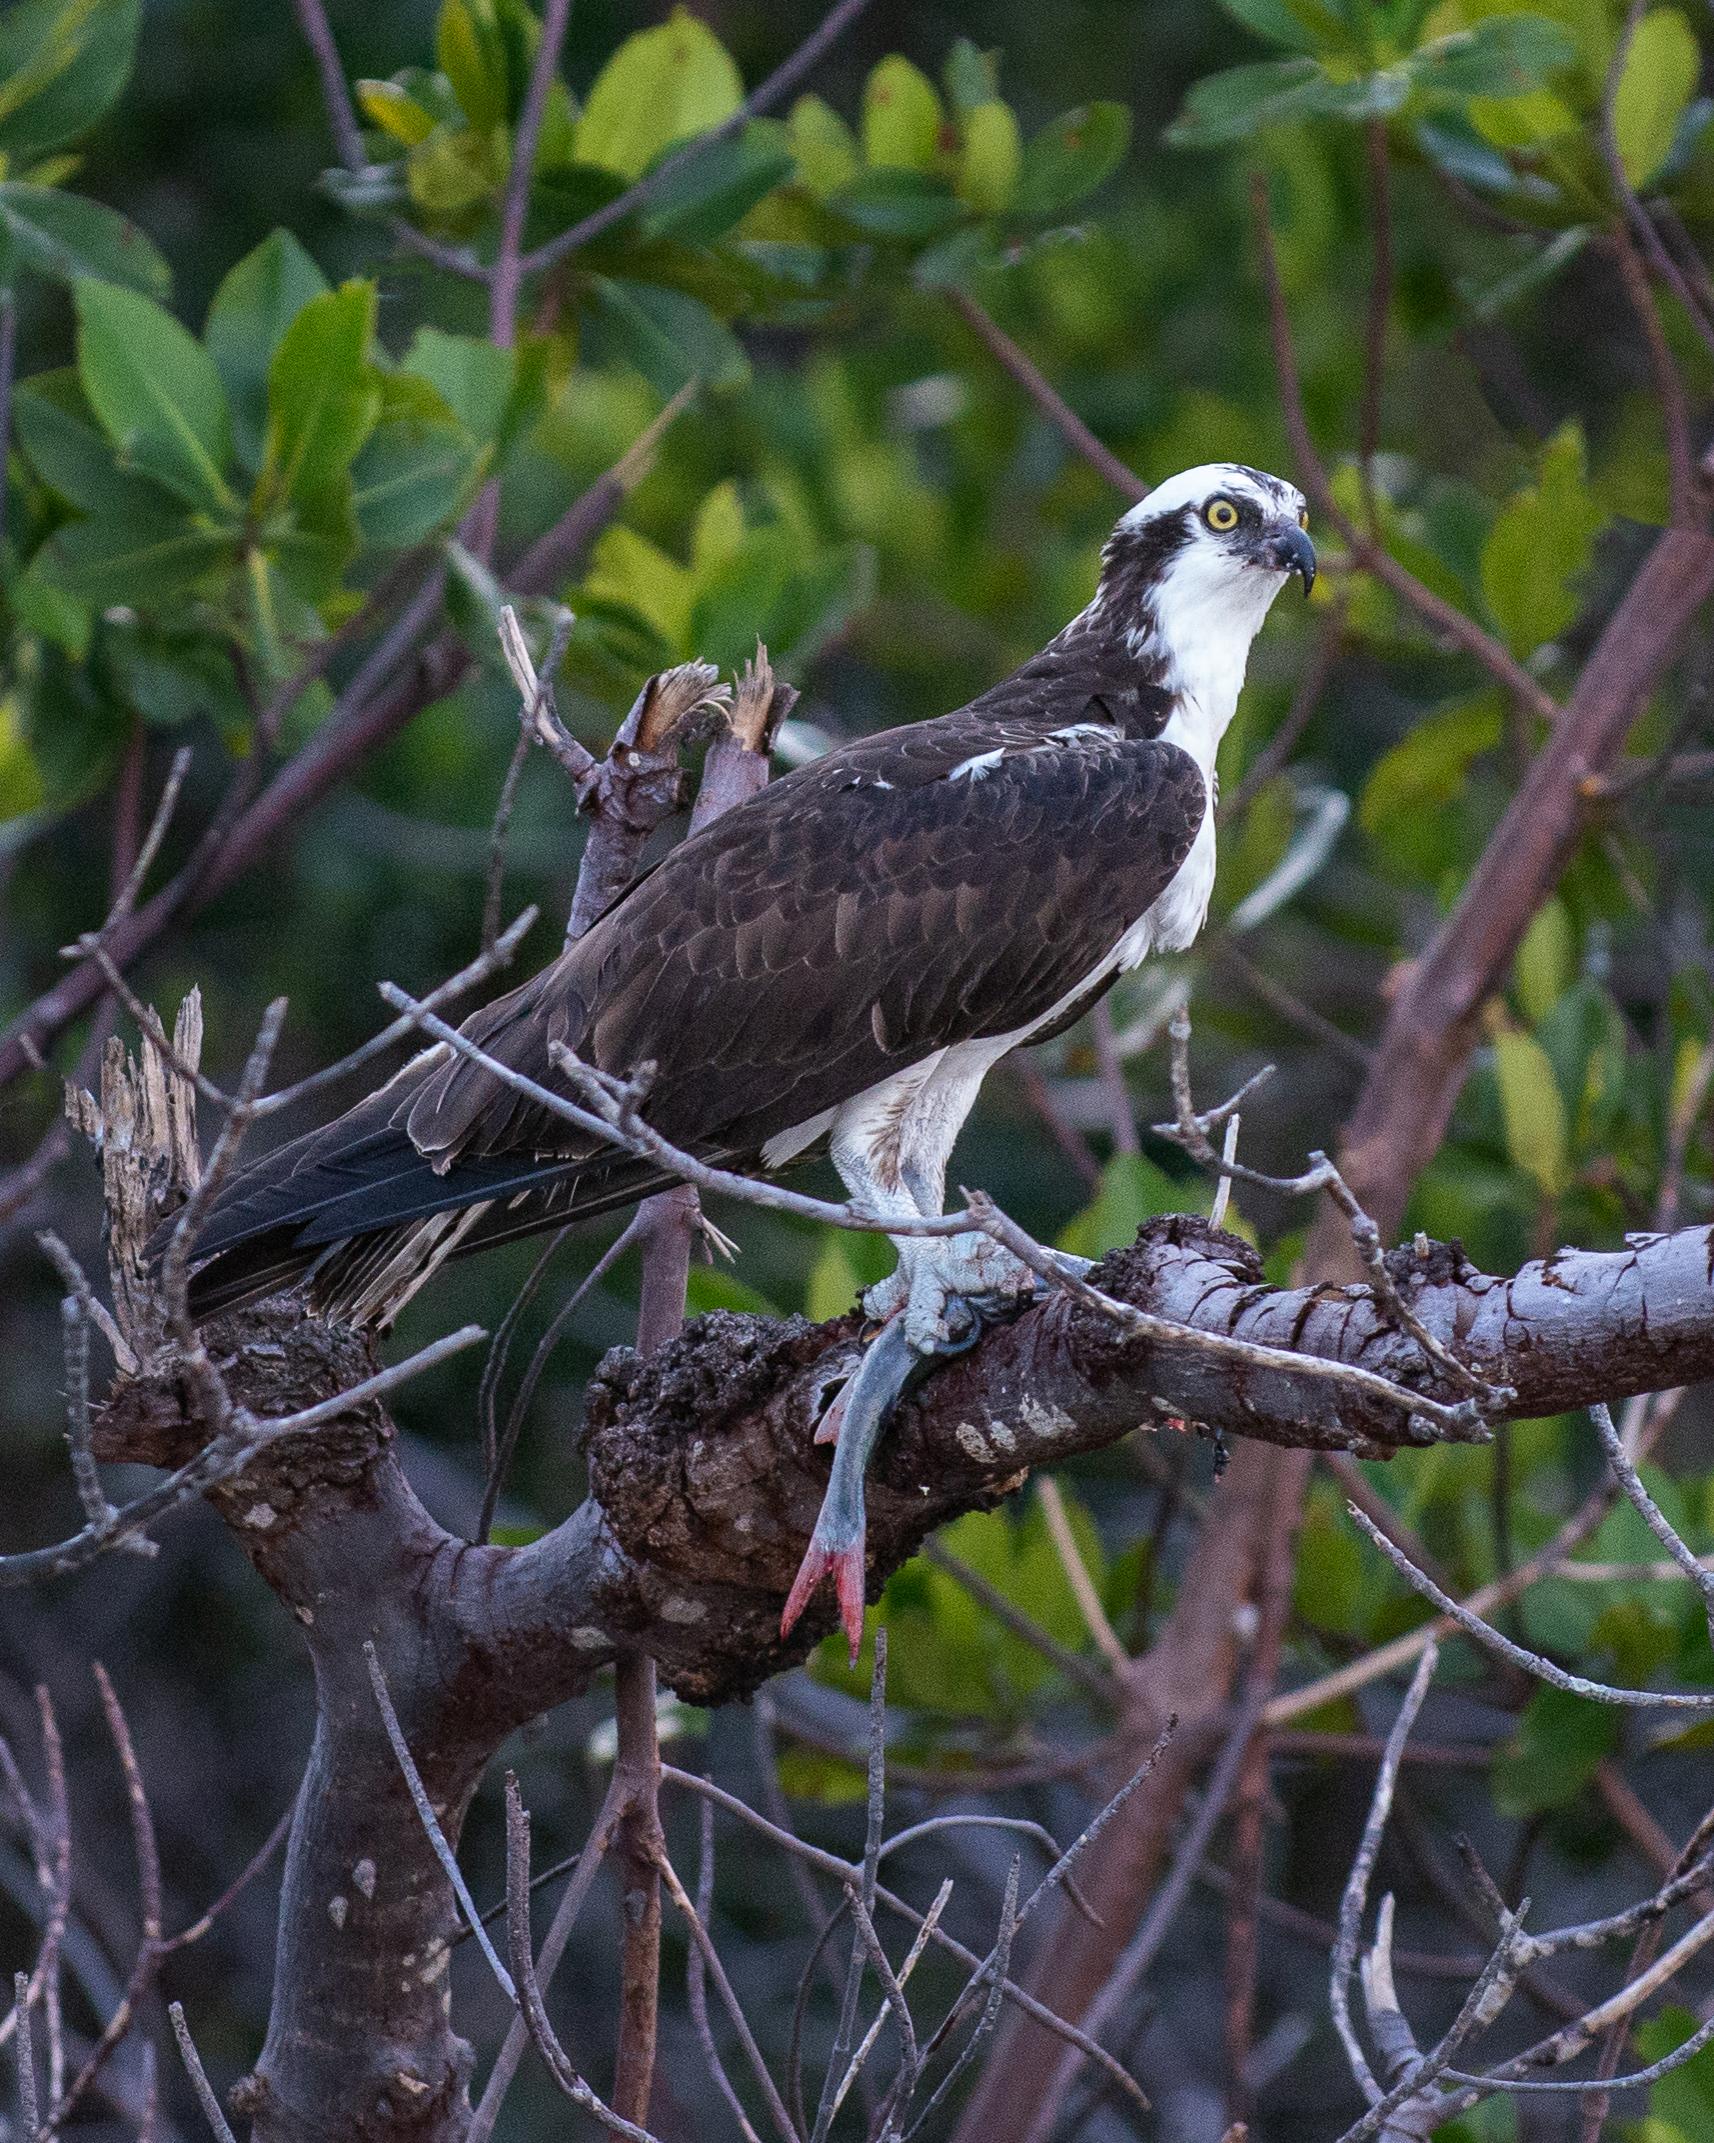 #osprey, #raptor, #wildlife, #nature, #prey, #fish, #rookerybay, #southwestconservancy, #naples, #florida, #nikon